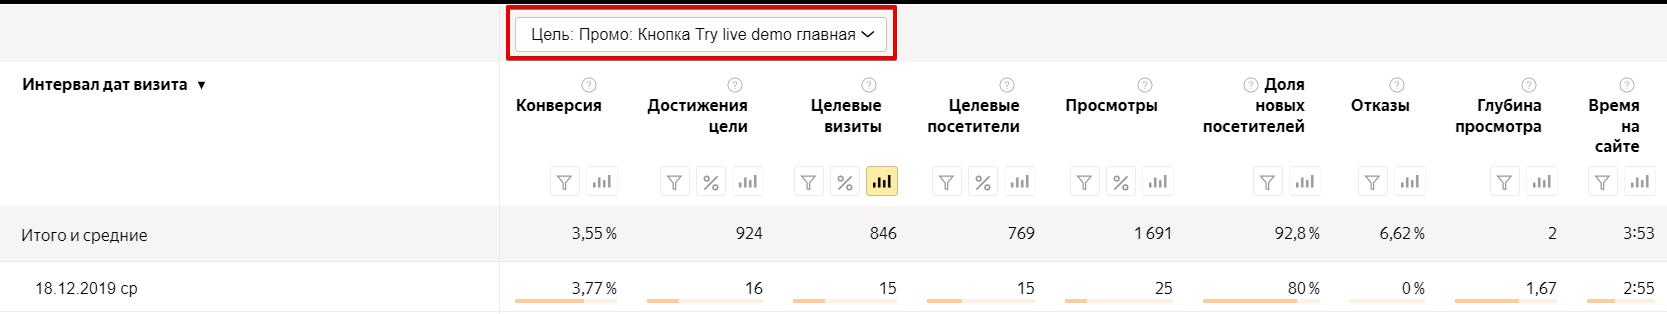 Количество достижений цели в Яндекс.Метрике